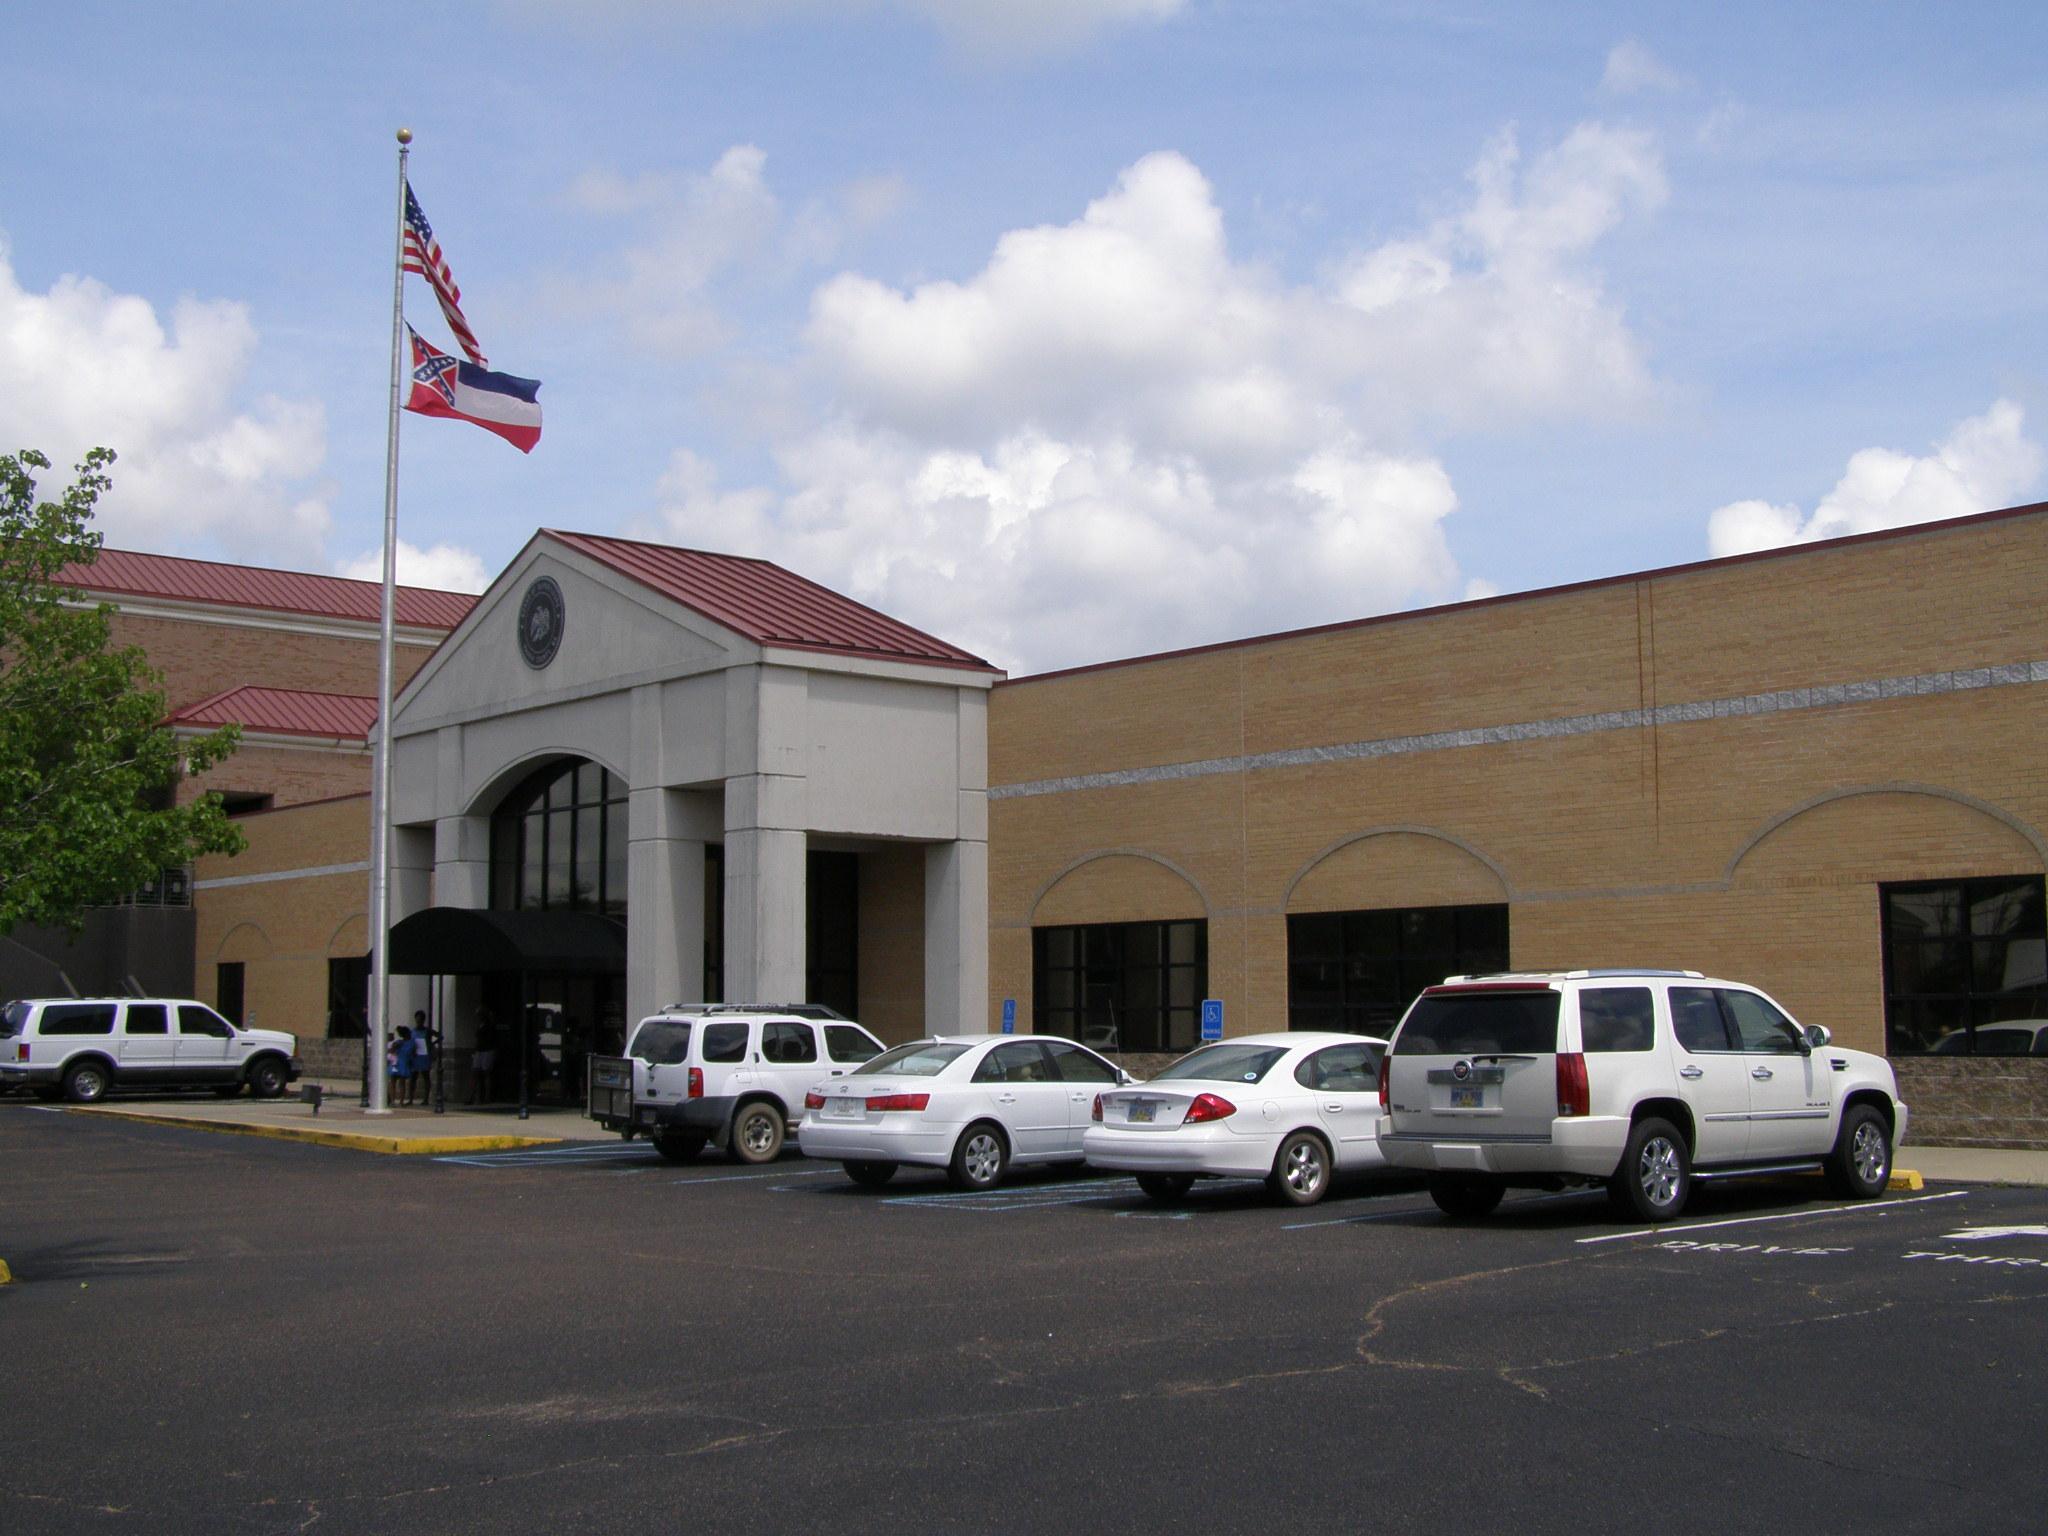 Mississippi rankin county sandhill - Rankin County